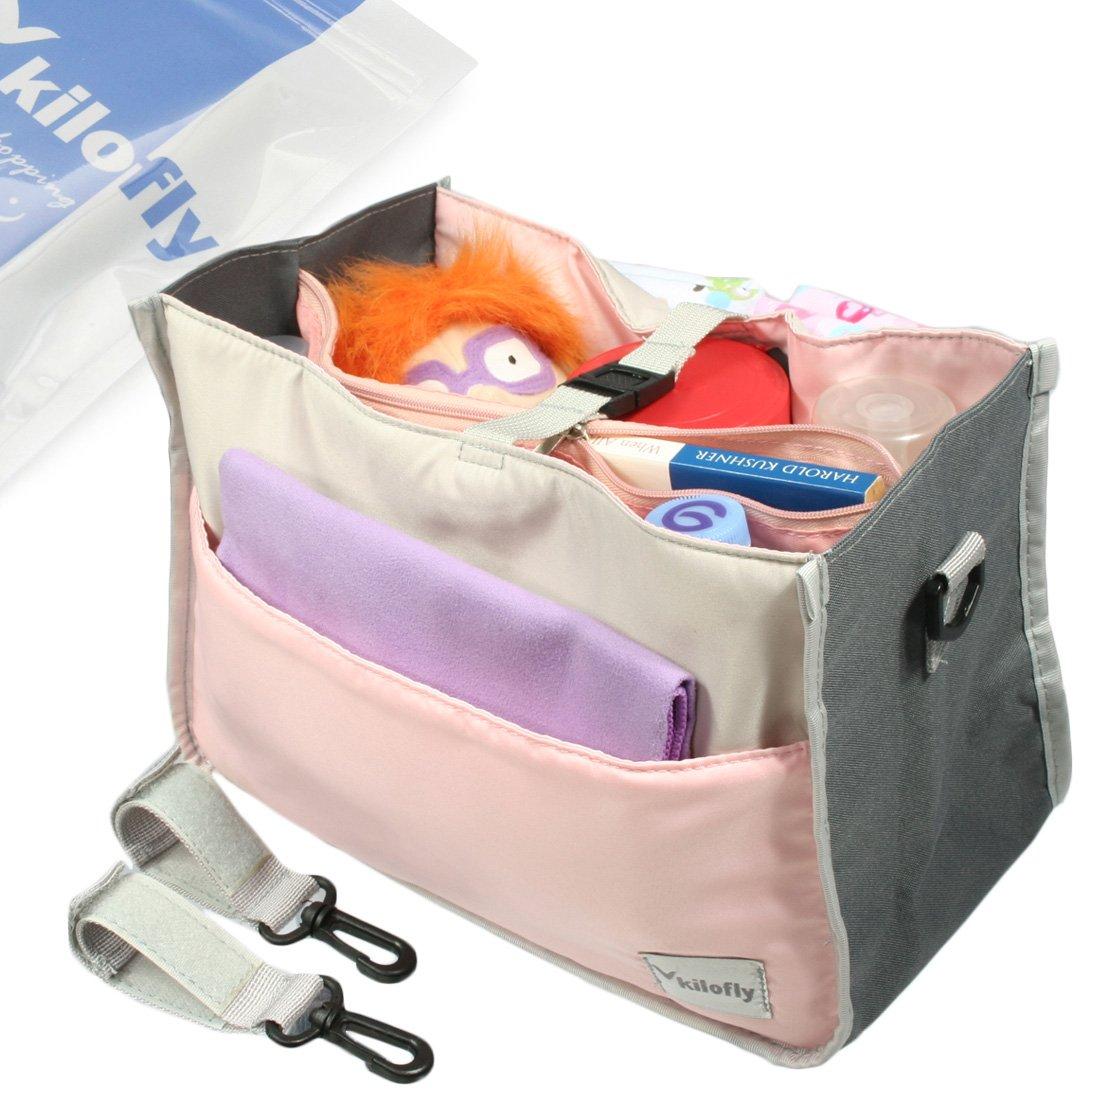 kilofly 2-in-1 Baby Diaper Bag Insert Stroller Organizer 2 Attachable Straps